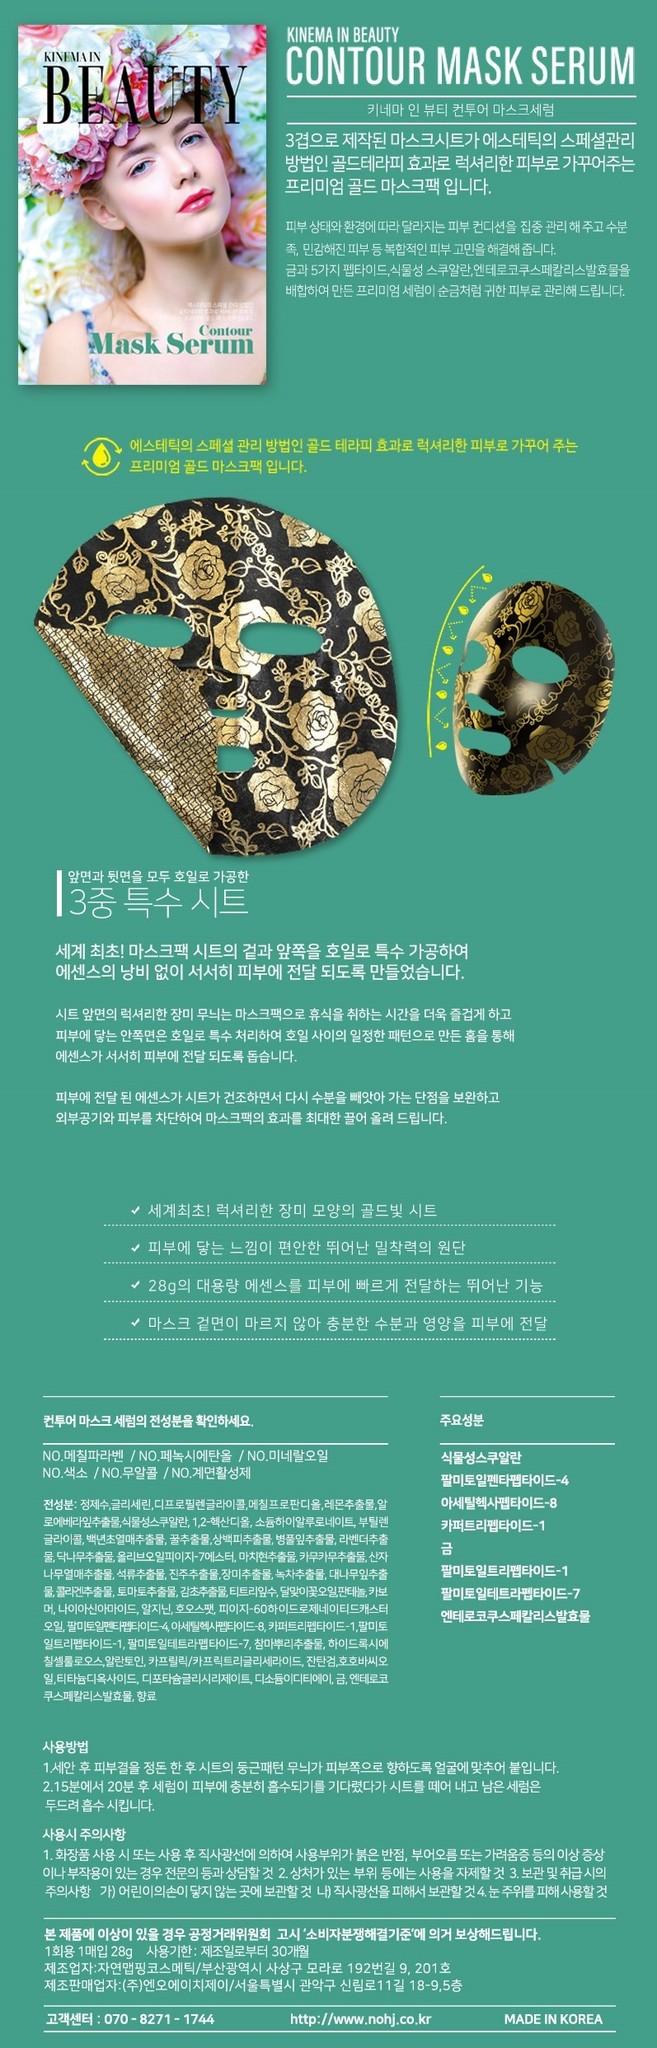 Kinema In Beauty Contour Mask Serum-3